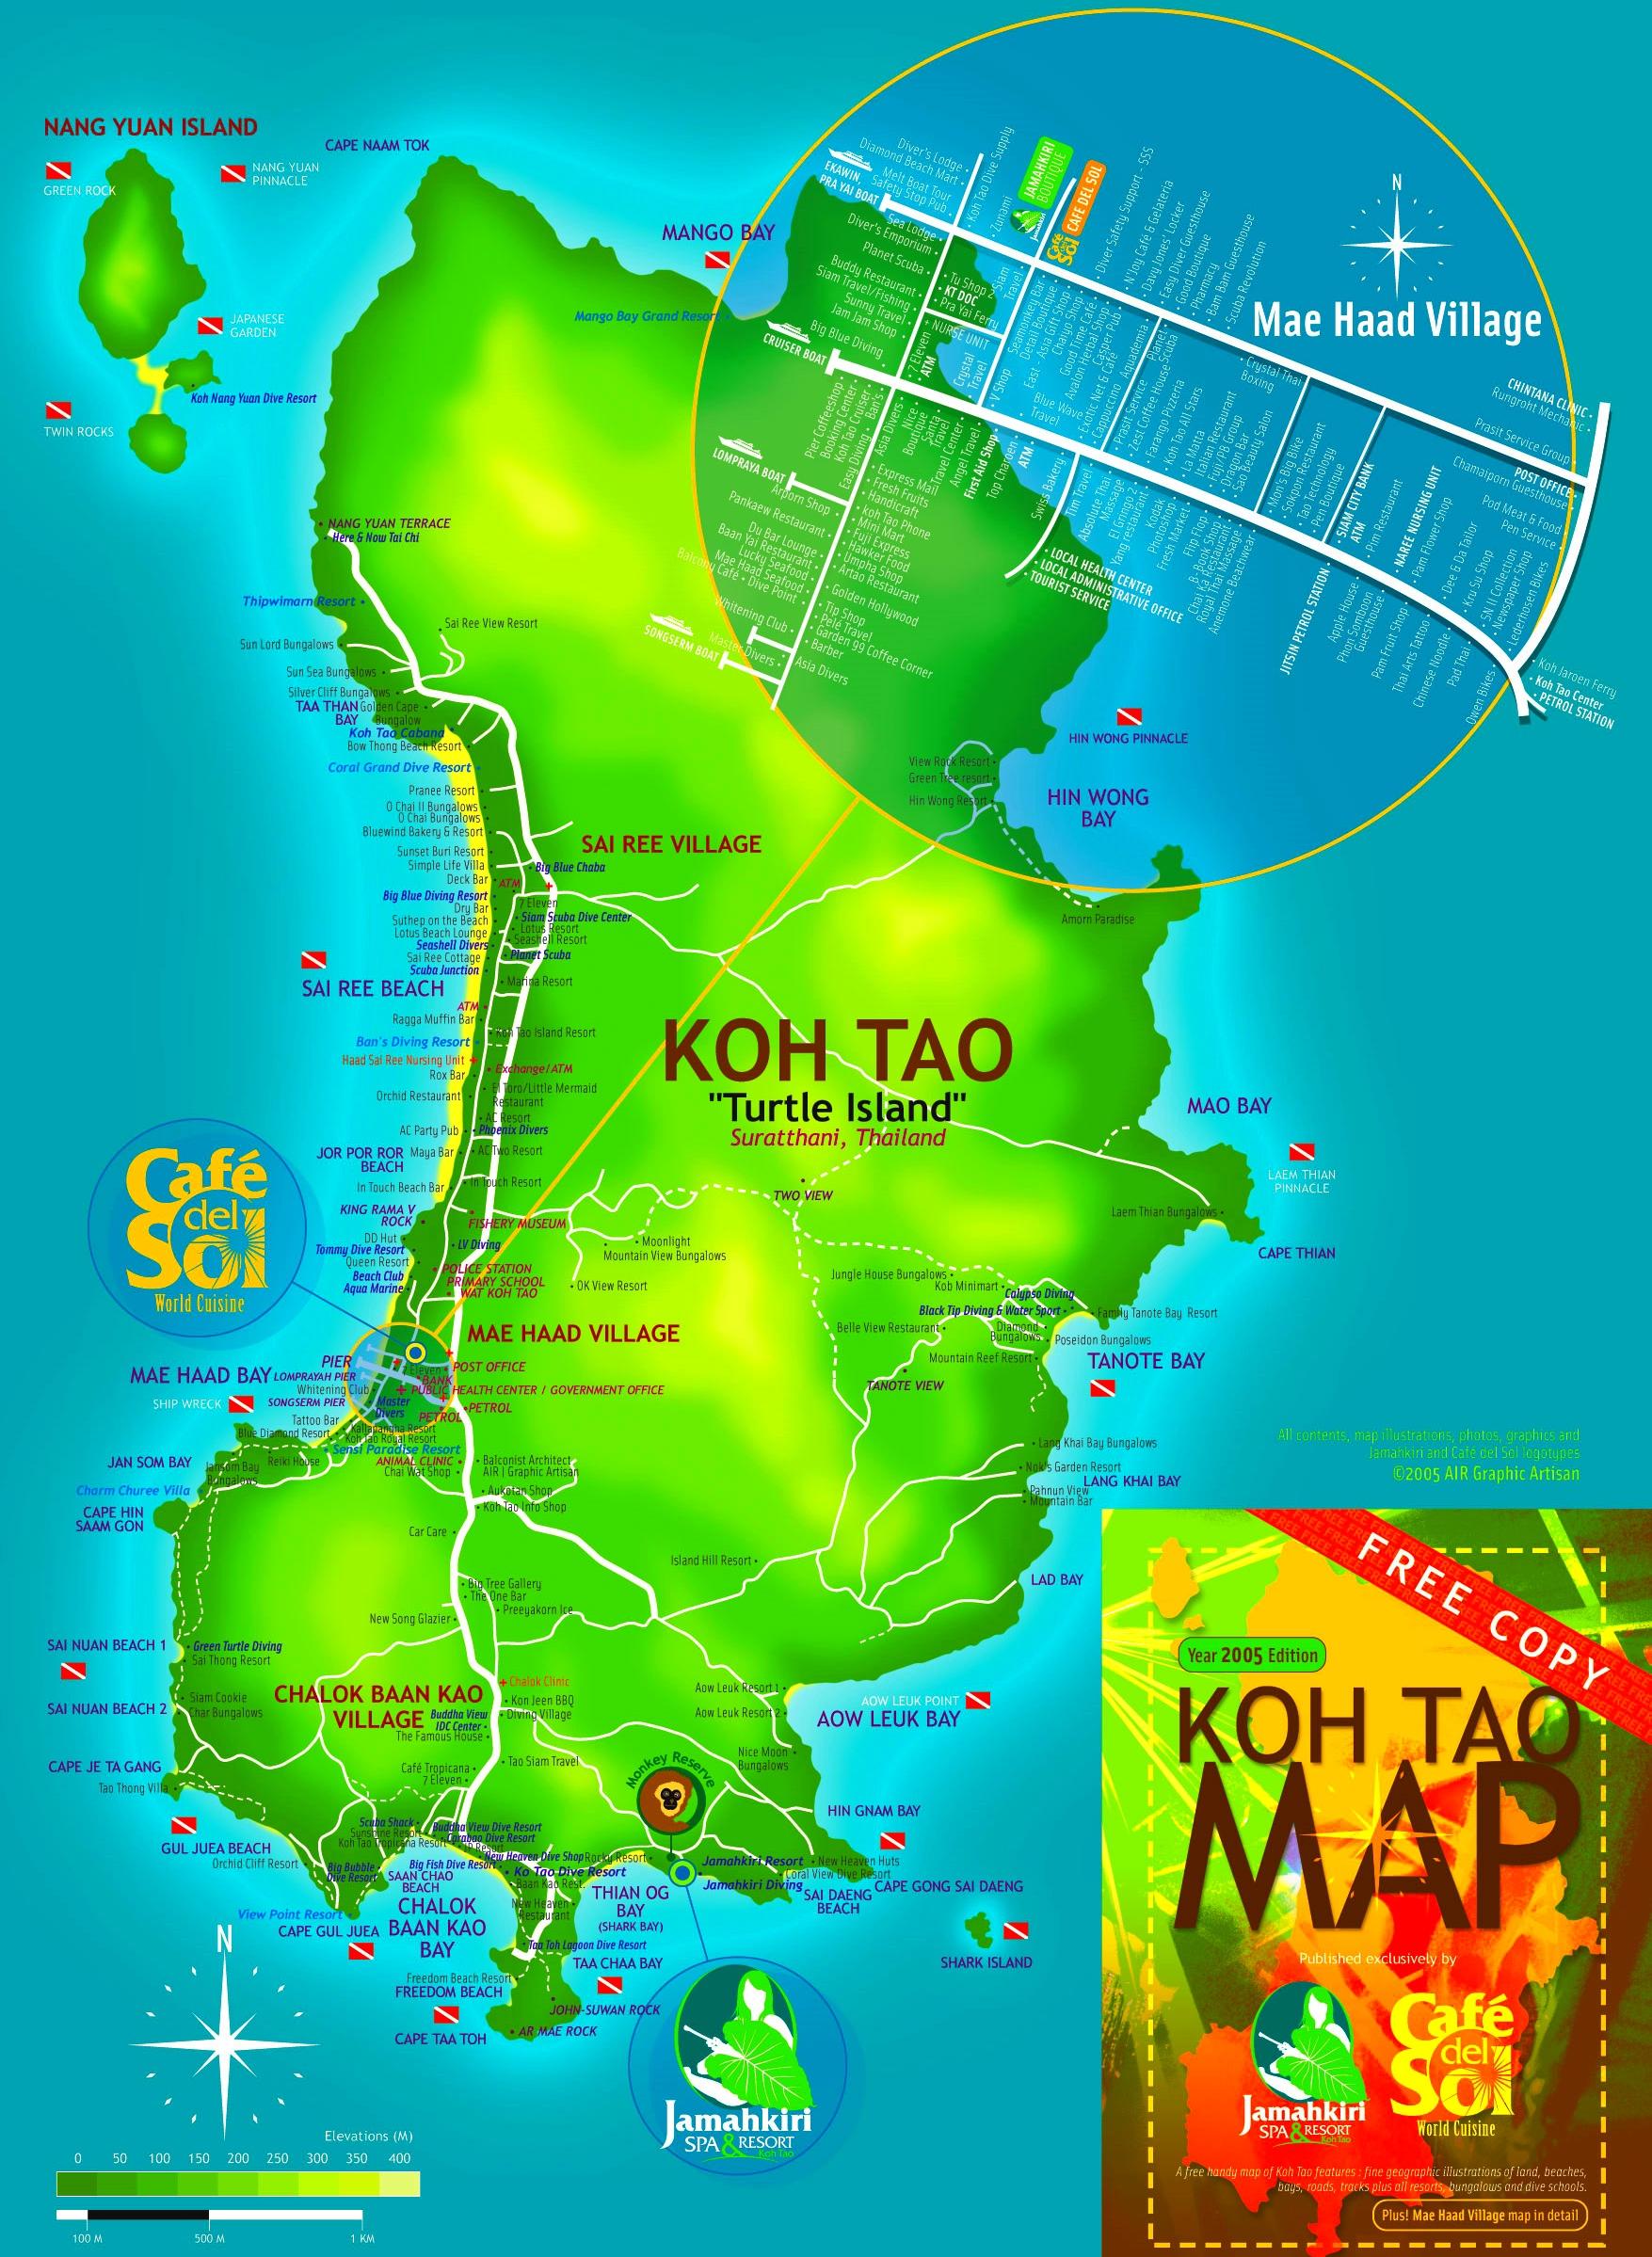 Detailed tourist map of Koh Tao on koh lanta thailand, koh samed thailand map, koh kood thailand map, koh phi phi thailand map, bophut thailand map, chiang mai thailand map, koh kut thailand map, cha-am thailand map, krabi thailand map, ancient china han empire map, kuala lumpur thailand map, koh nang yuan thailand map, nakhon phanom thailand map, suratthani thailand map, satun thailand map, pattaya thailand map, mae sai thailand map, pee pee island thailand map, koh kradan thailand map, cebu taoist temple map,